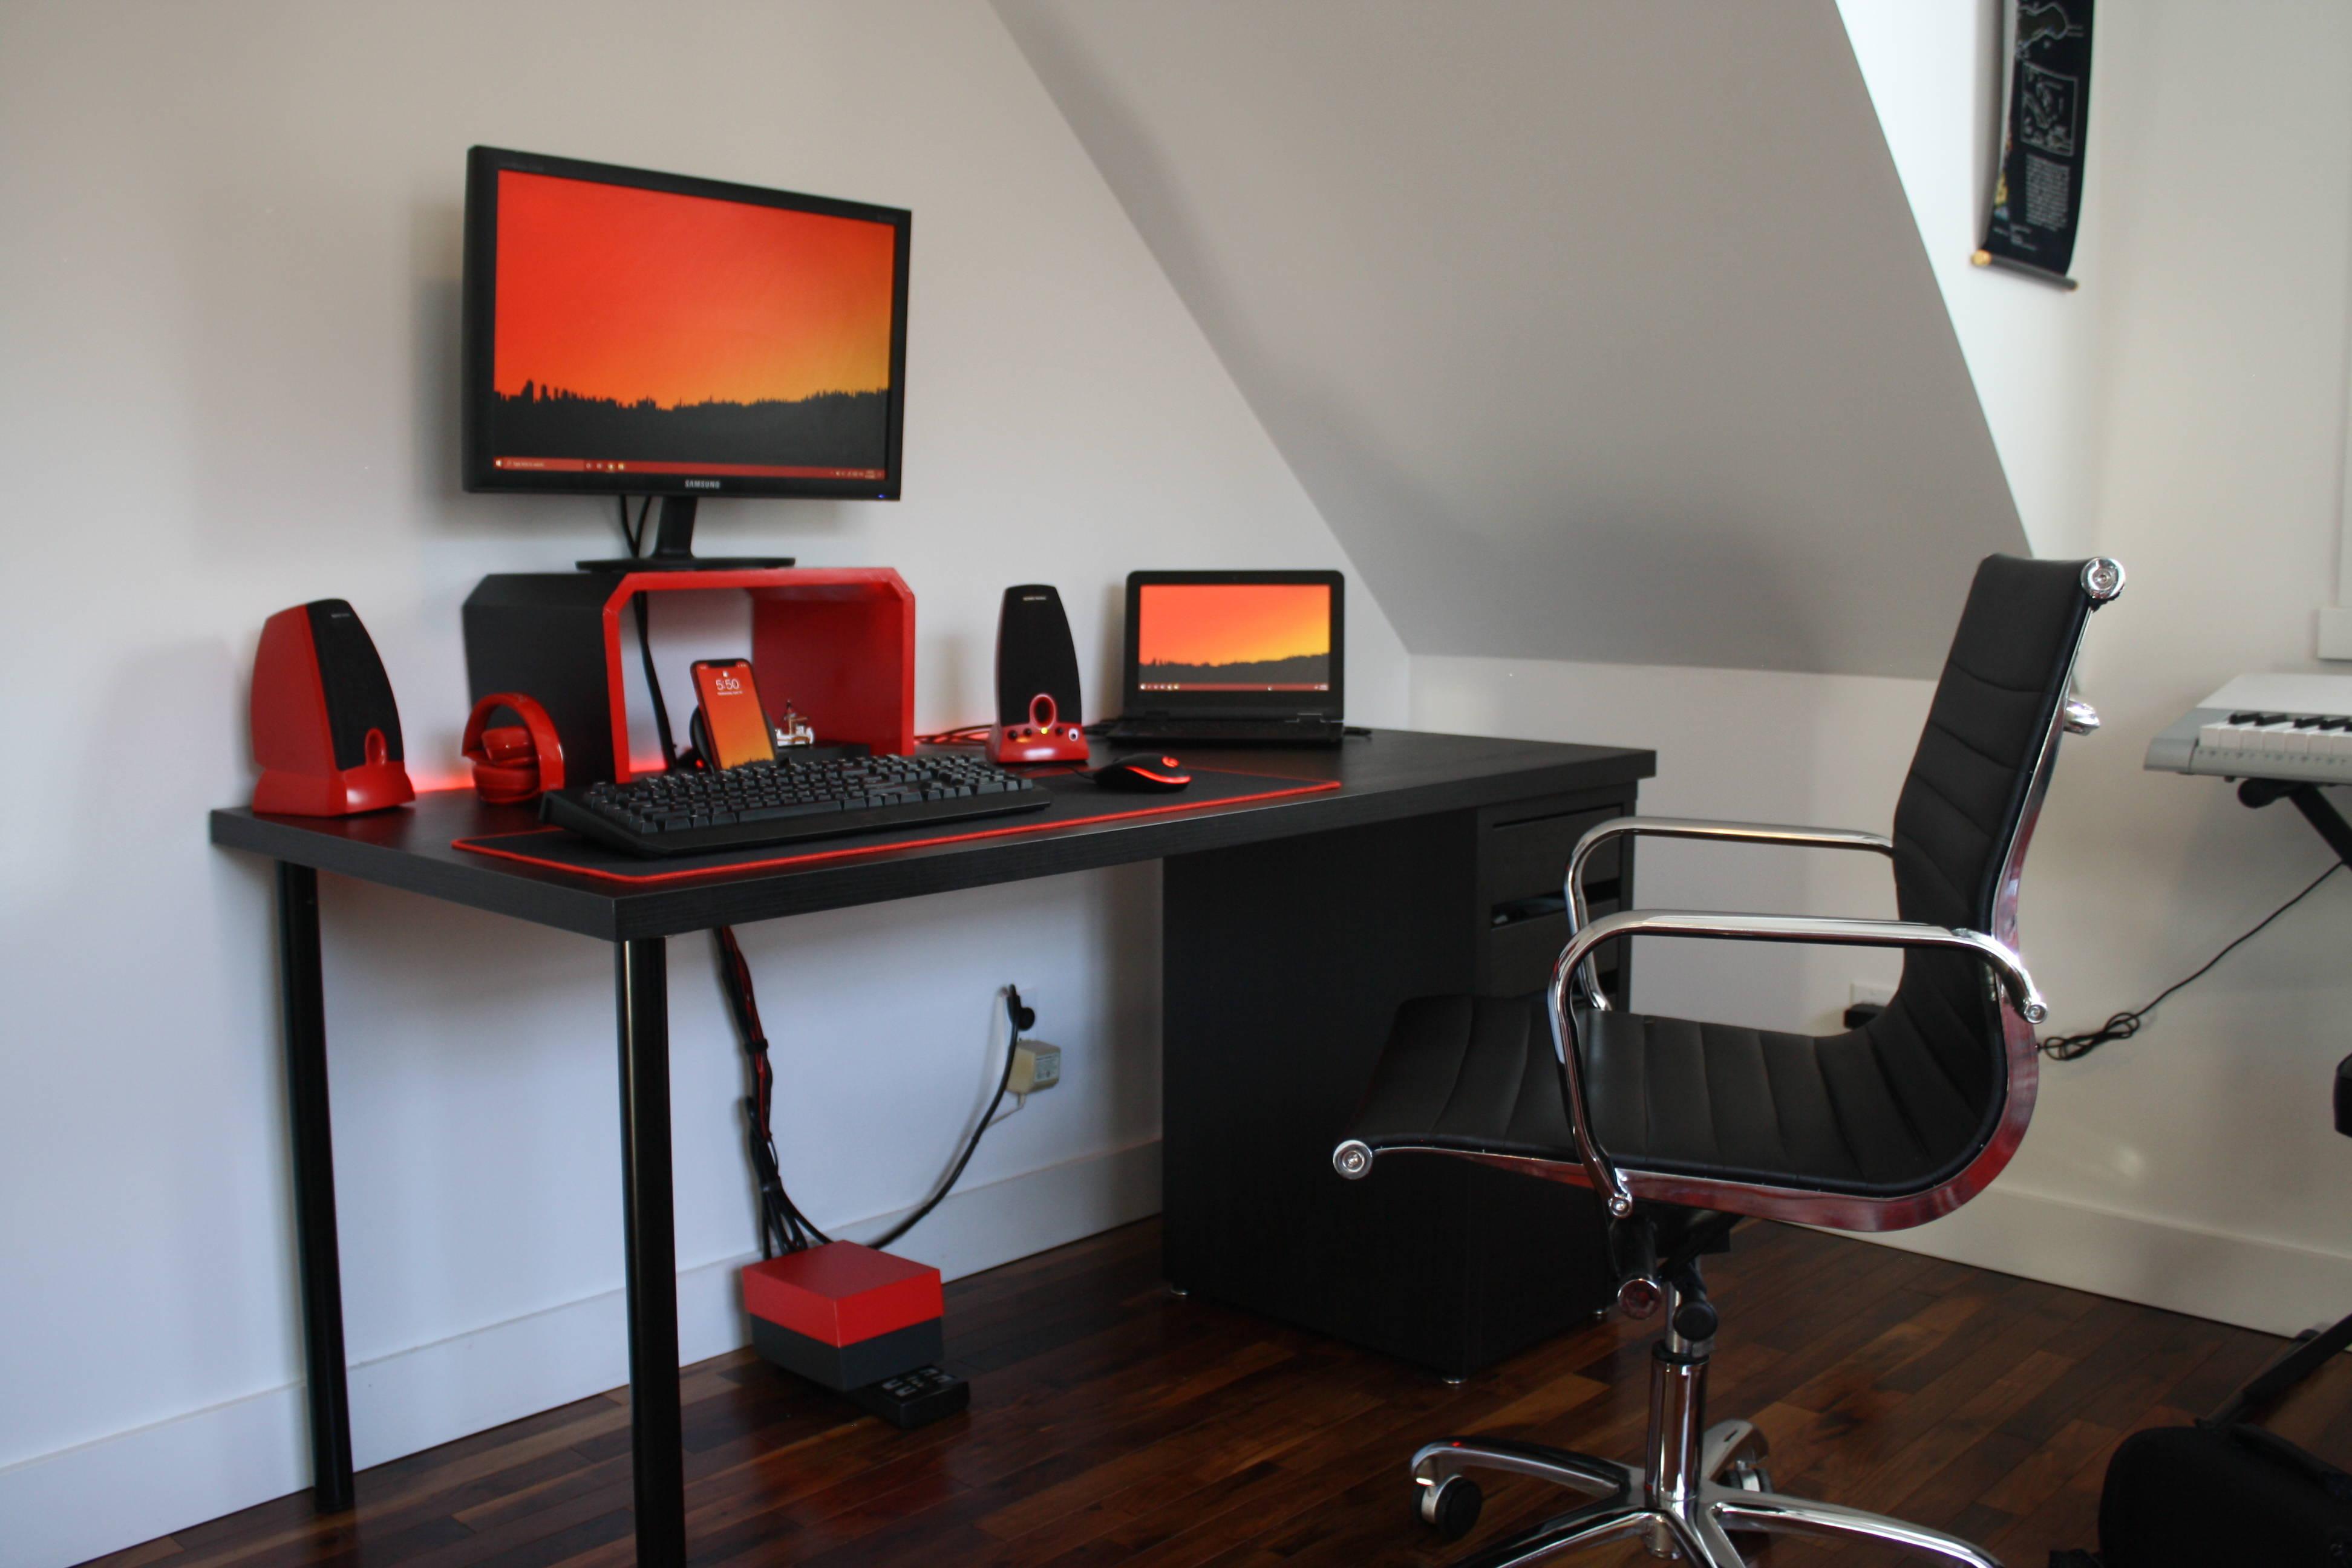 BenSetup's Setup - Teen Budget Red and Black Setup   Scooget